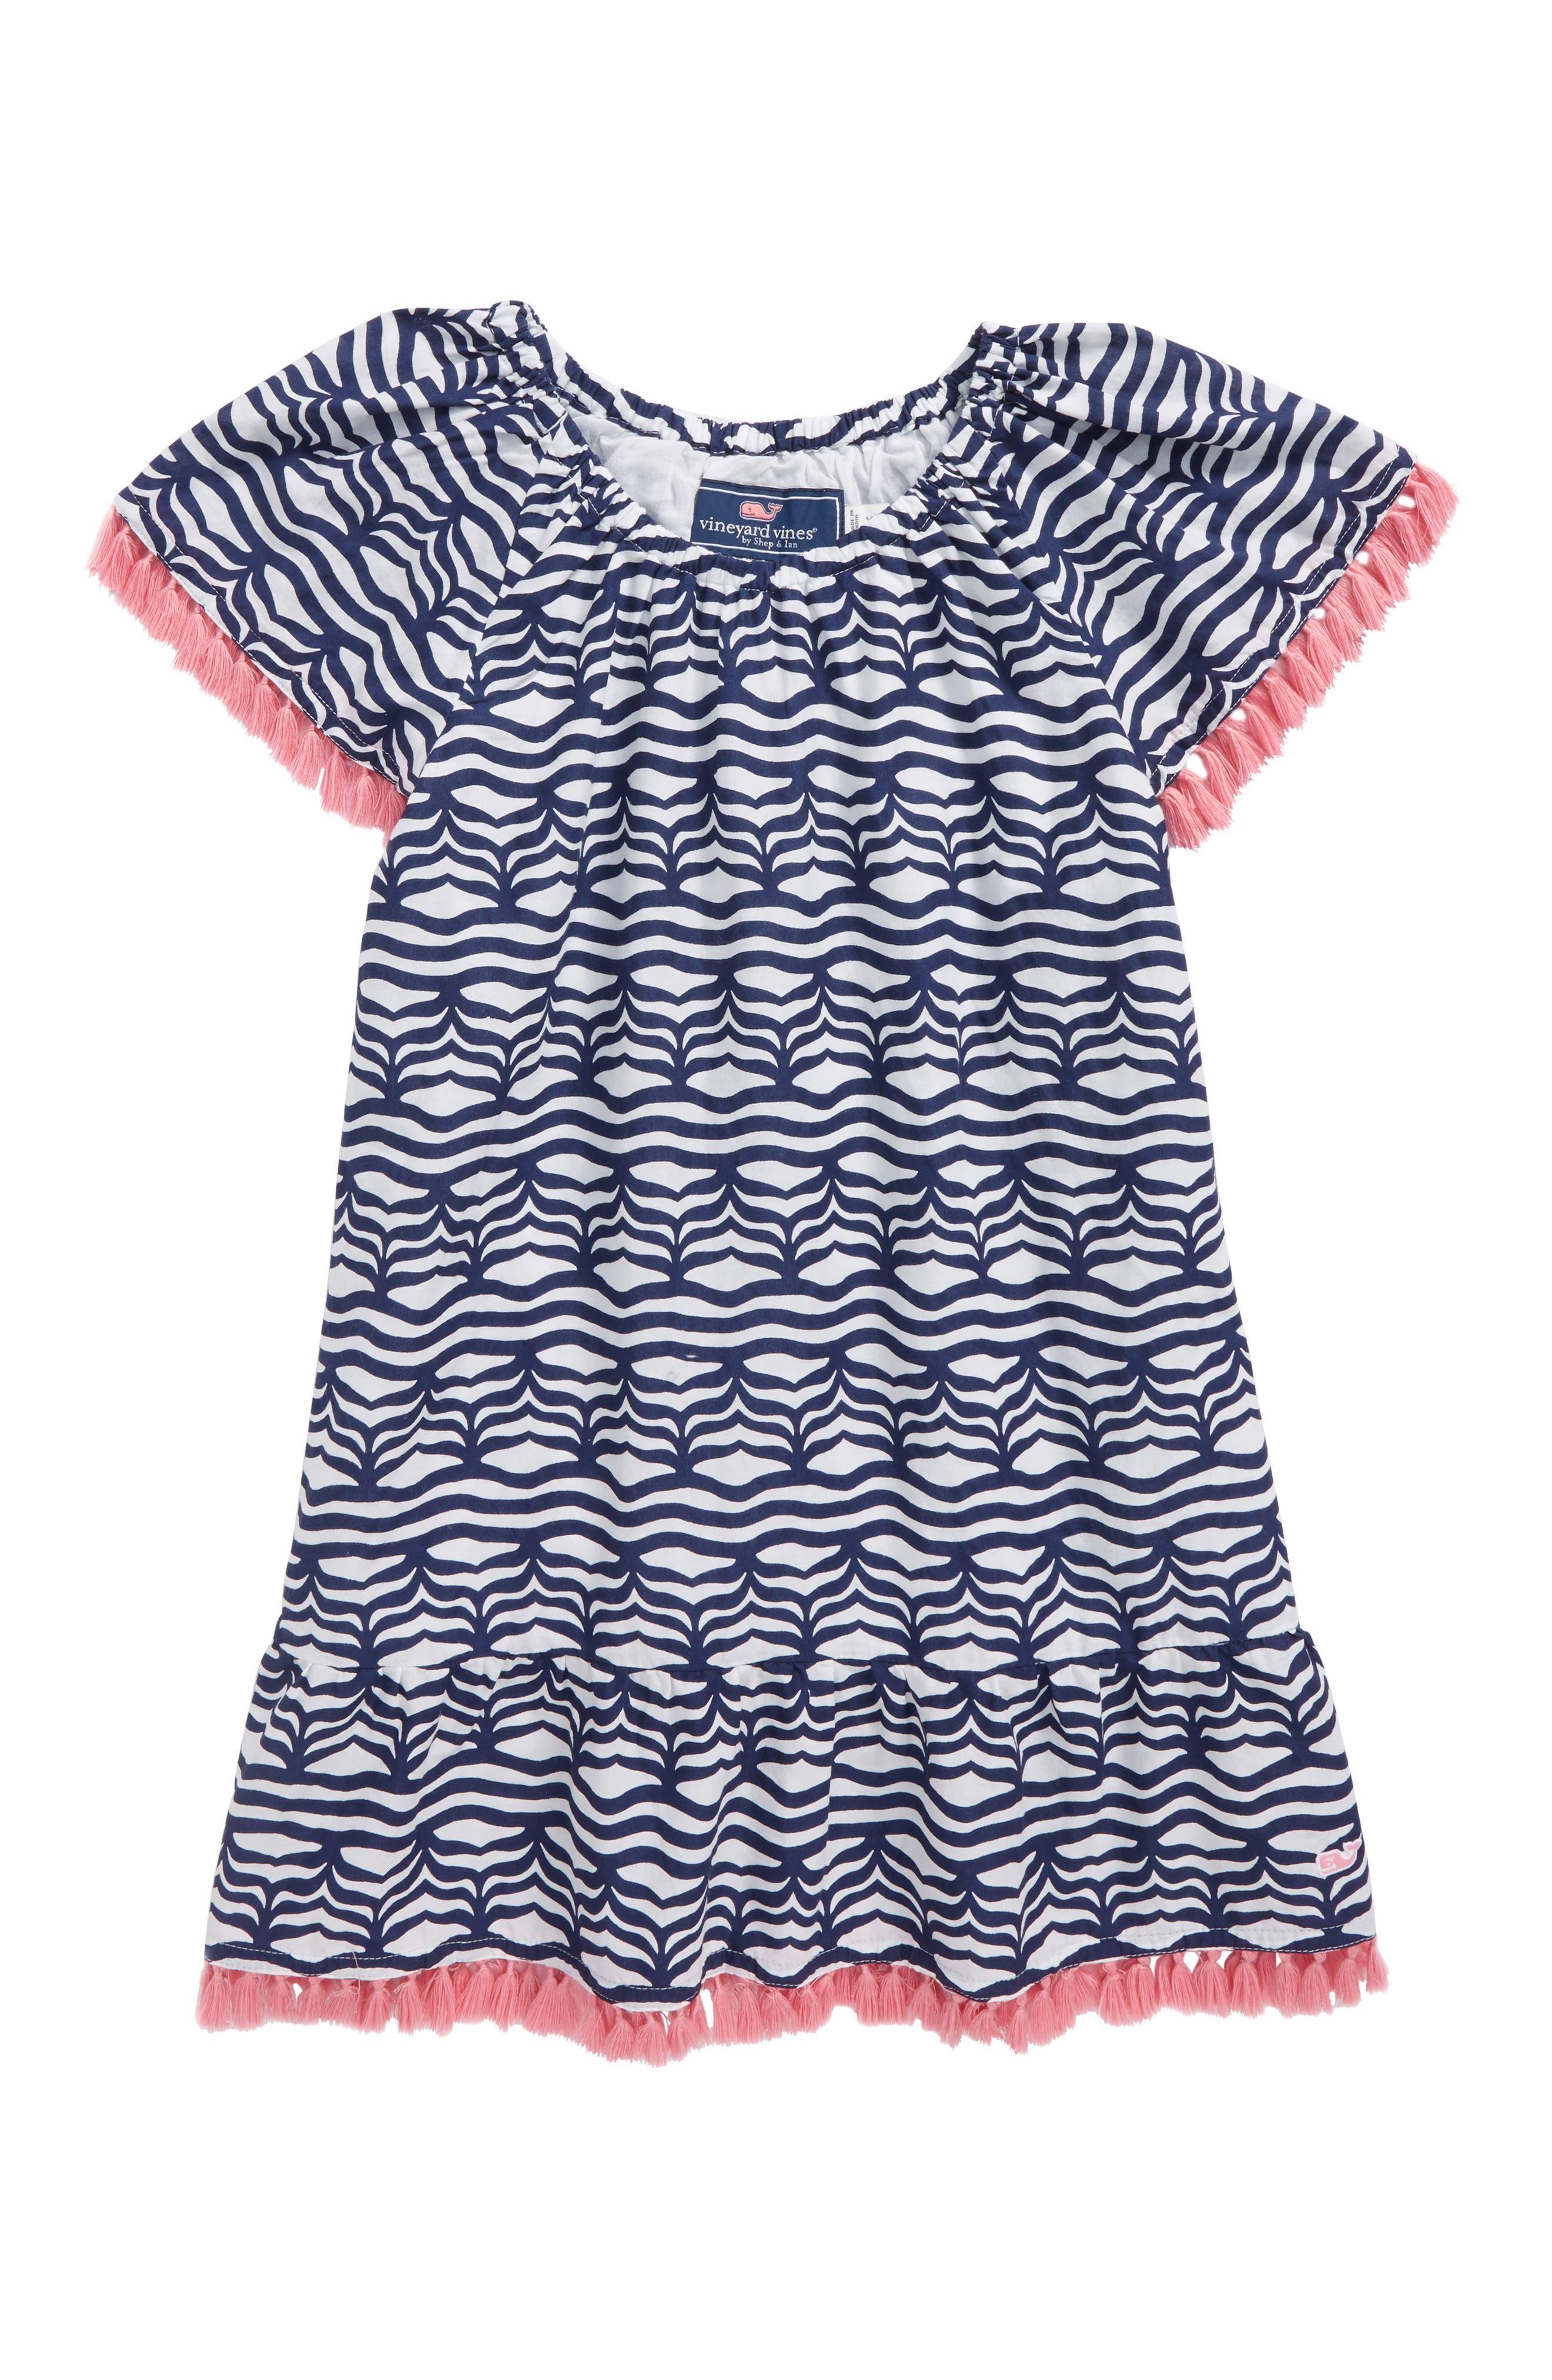 vineyard vines Whale Tail Wave Dress (Toddler Girls)